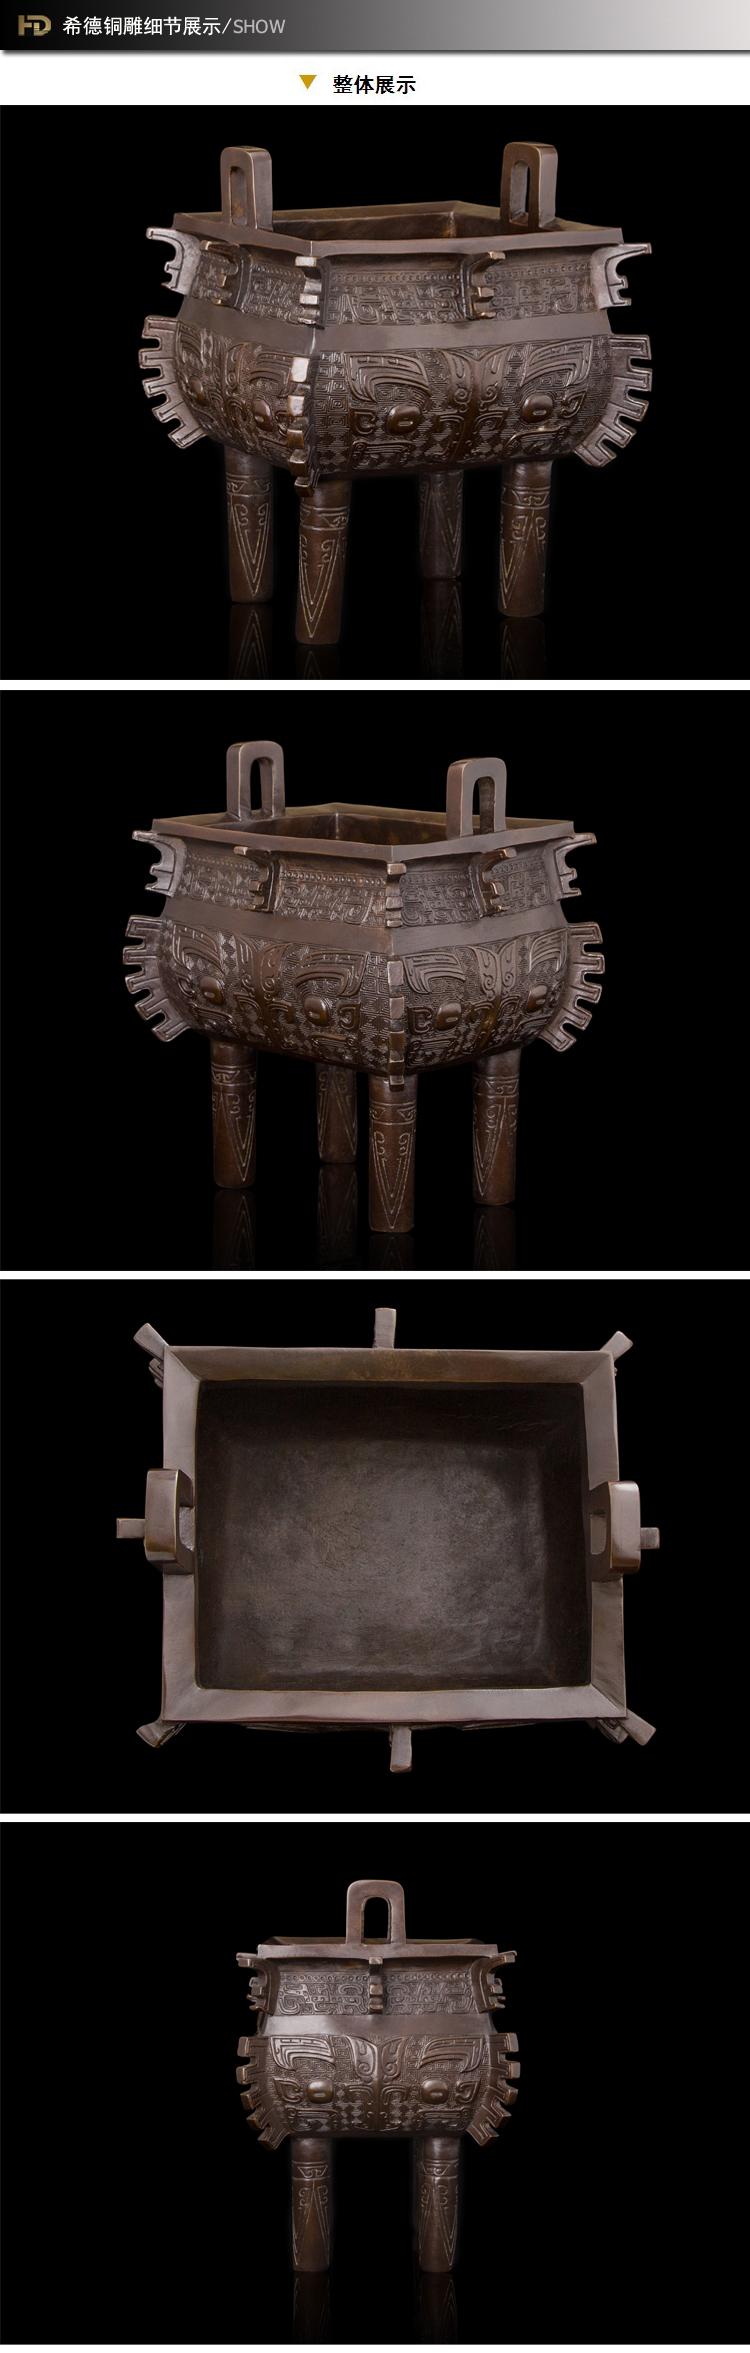 Head Arts Crafts Copper Ware Antique Cultural Relics Of Moeszaffir Rana Lid Accent Hand Bag Dark Green Lizard Chinese Study Shang Yu Fang Ding Hd100 Us526